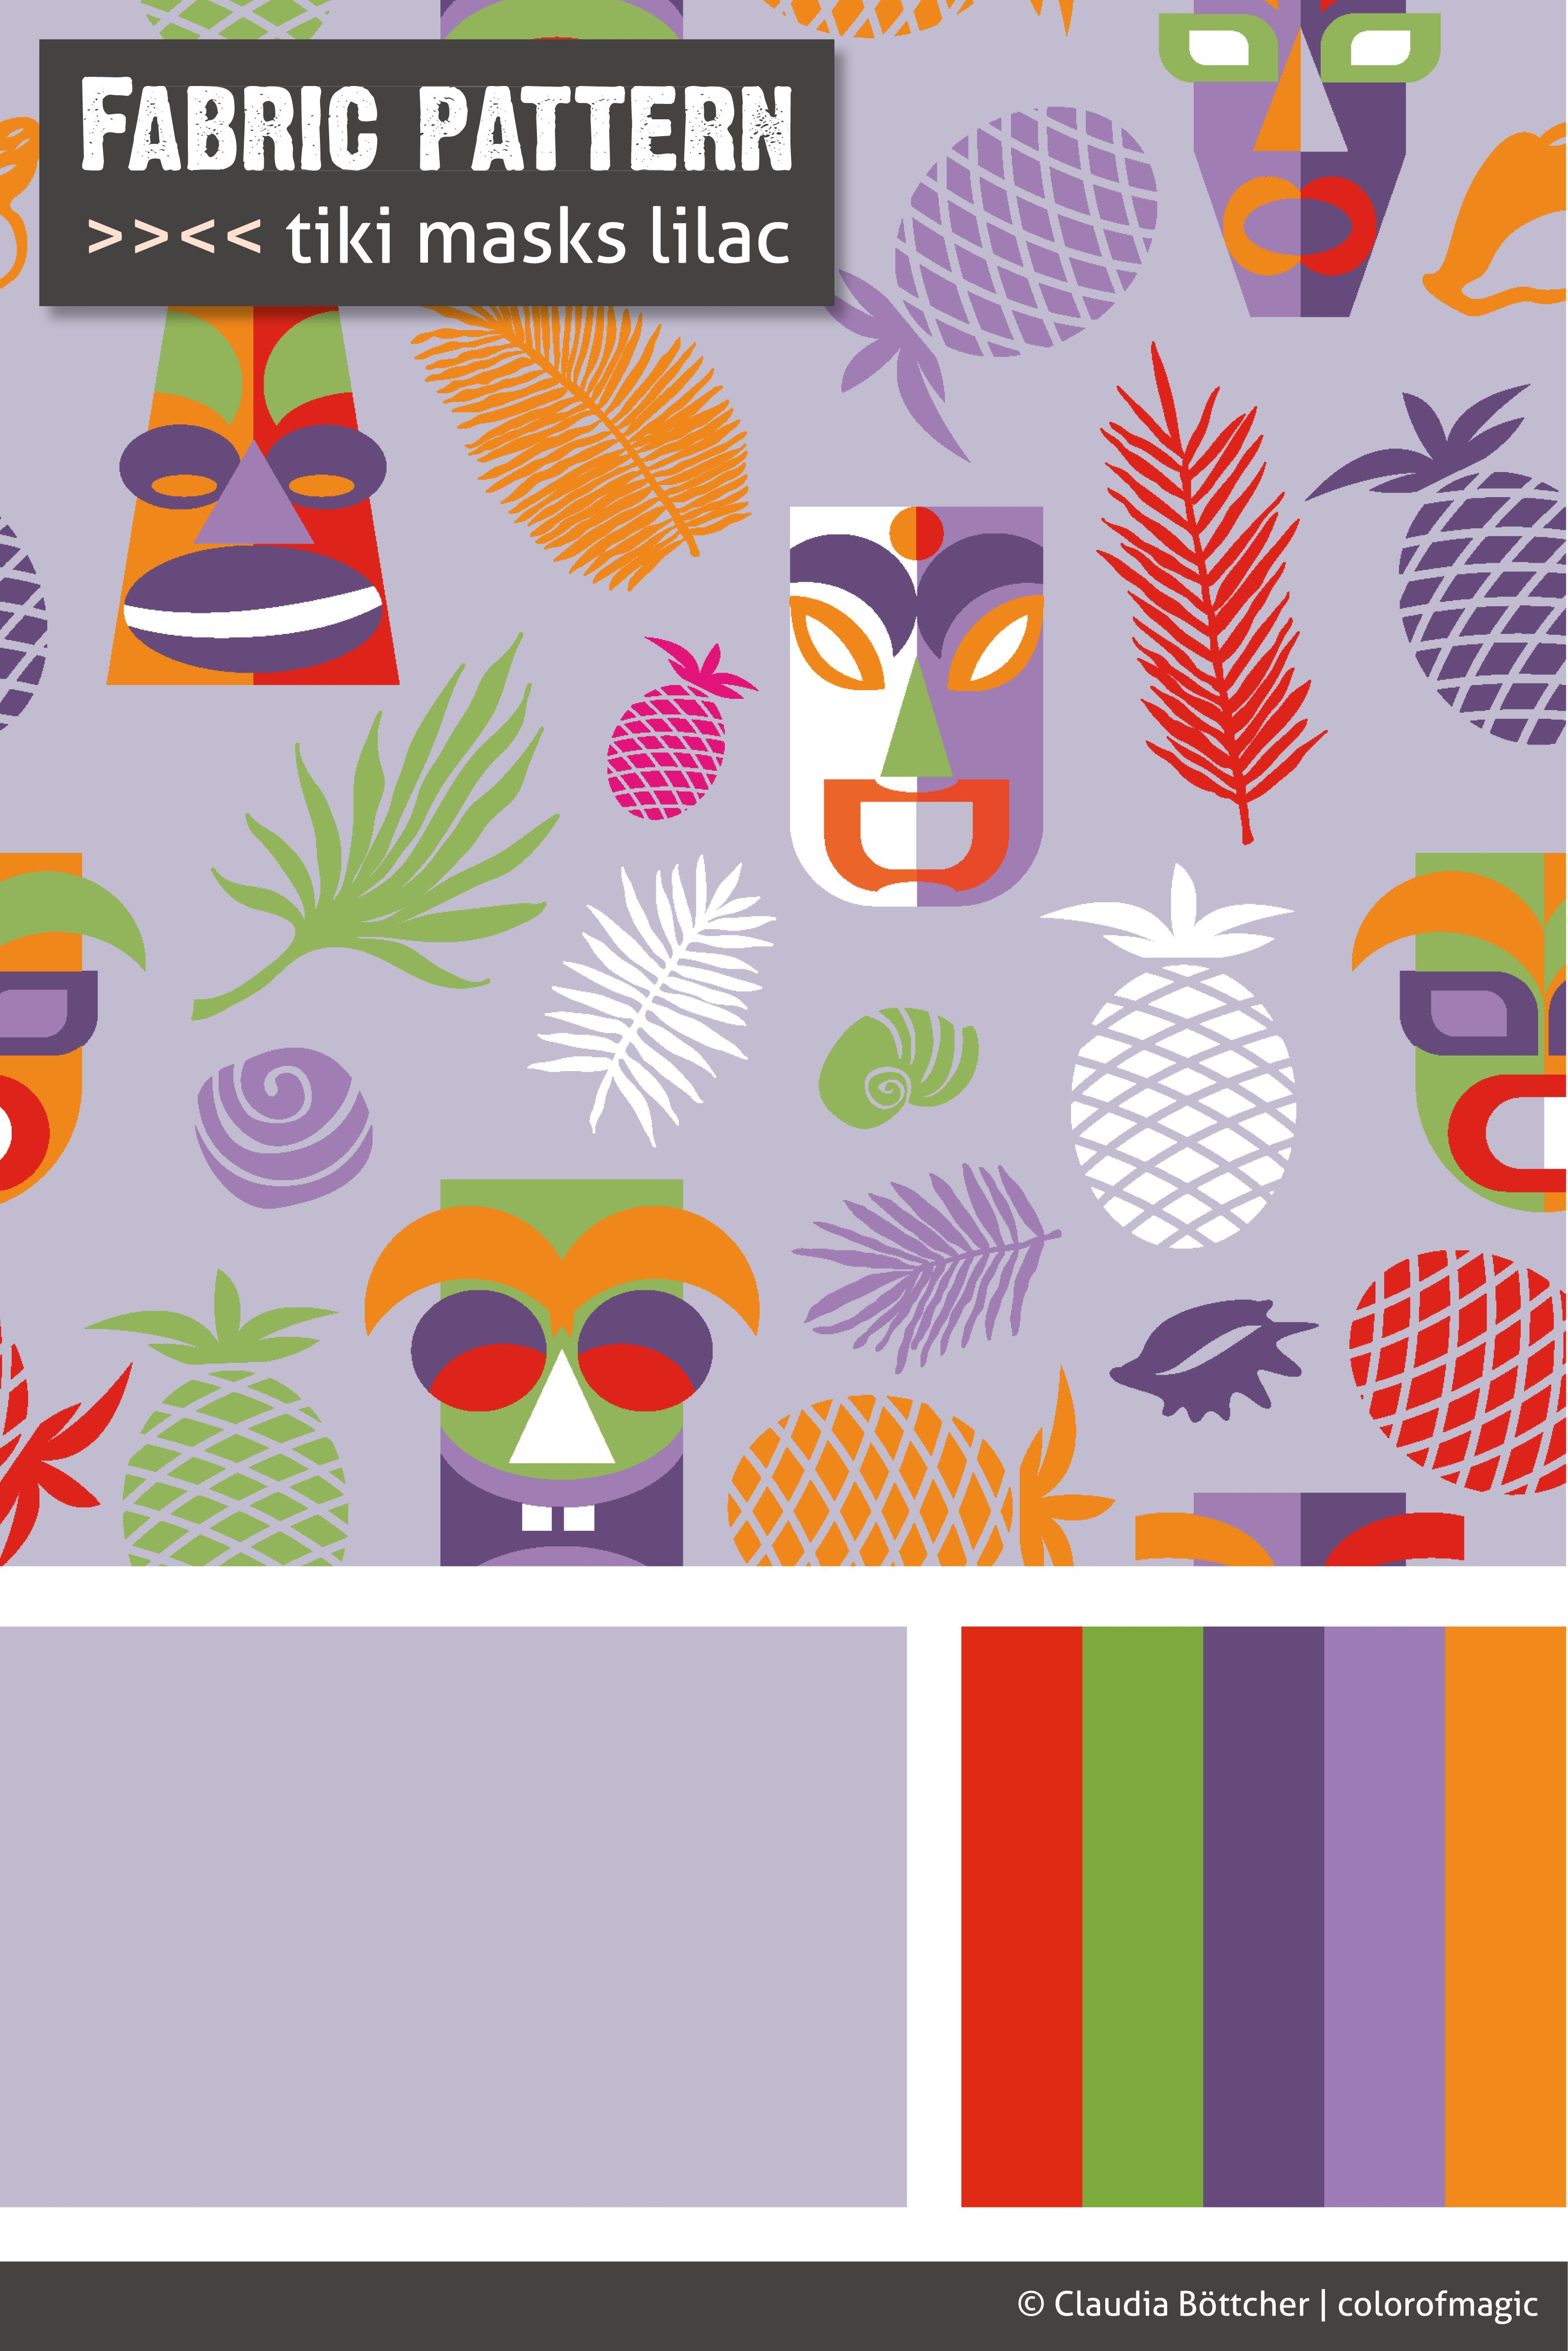 Ausgezeichnet Hawaiian Muster Nähen Ideen - Strickmuster-Ideen ...